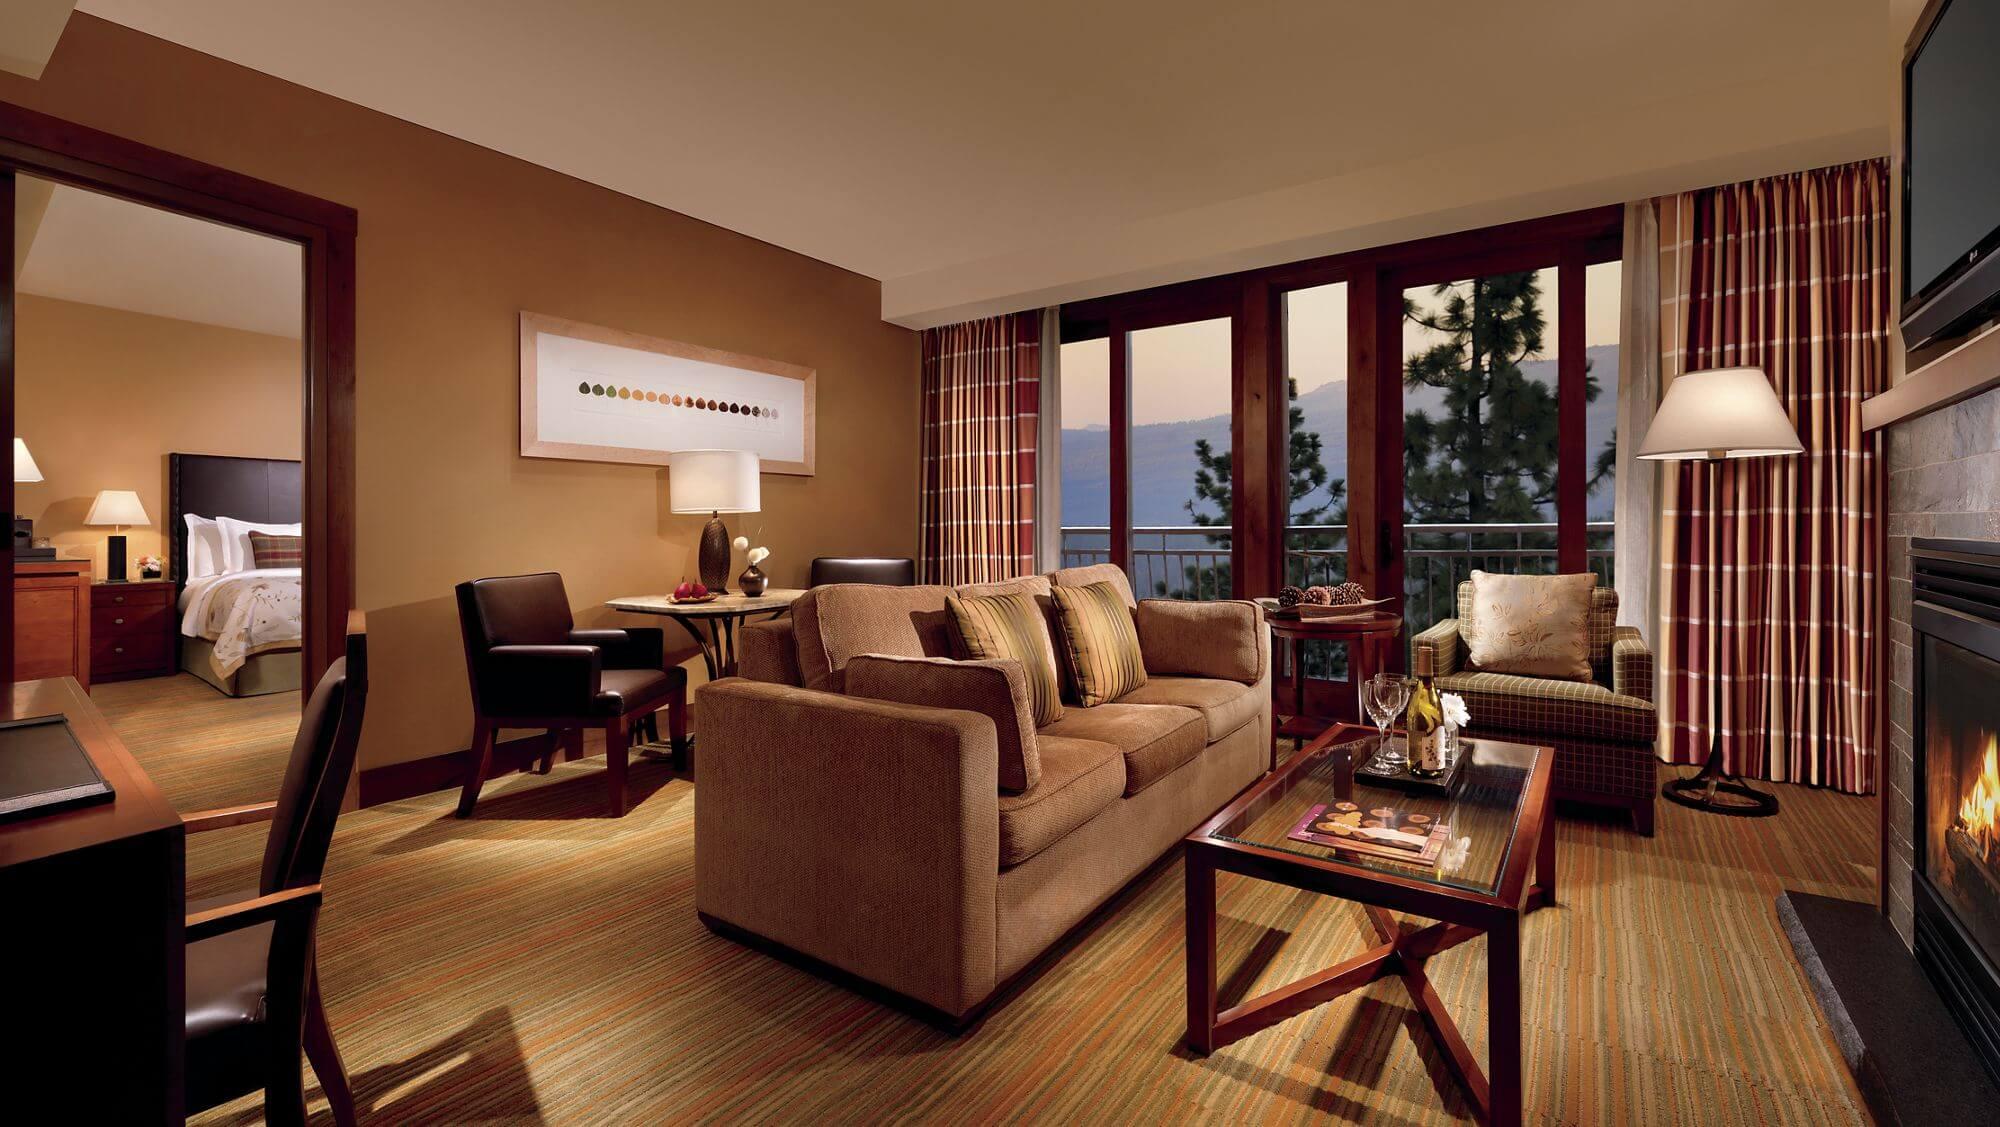 The Ritz Carlton Lake Tahoe About Destination Club Ownership